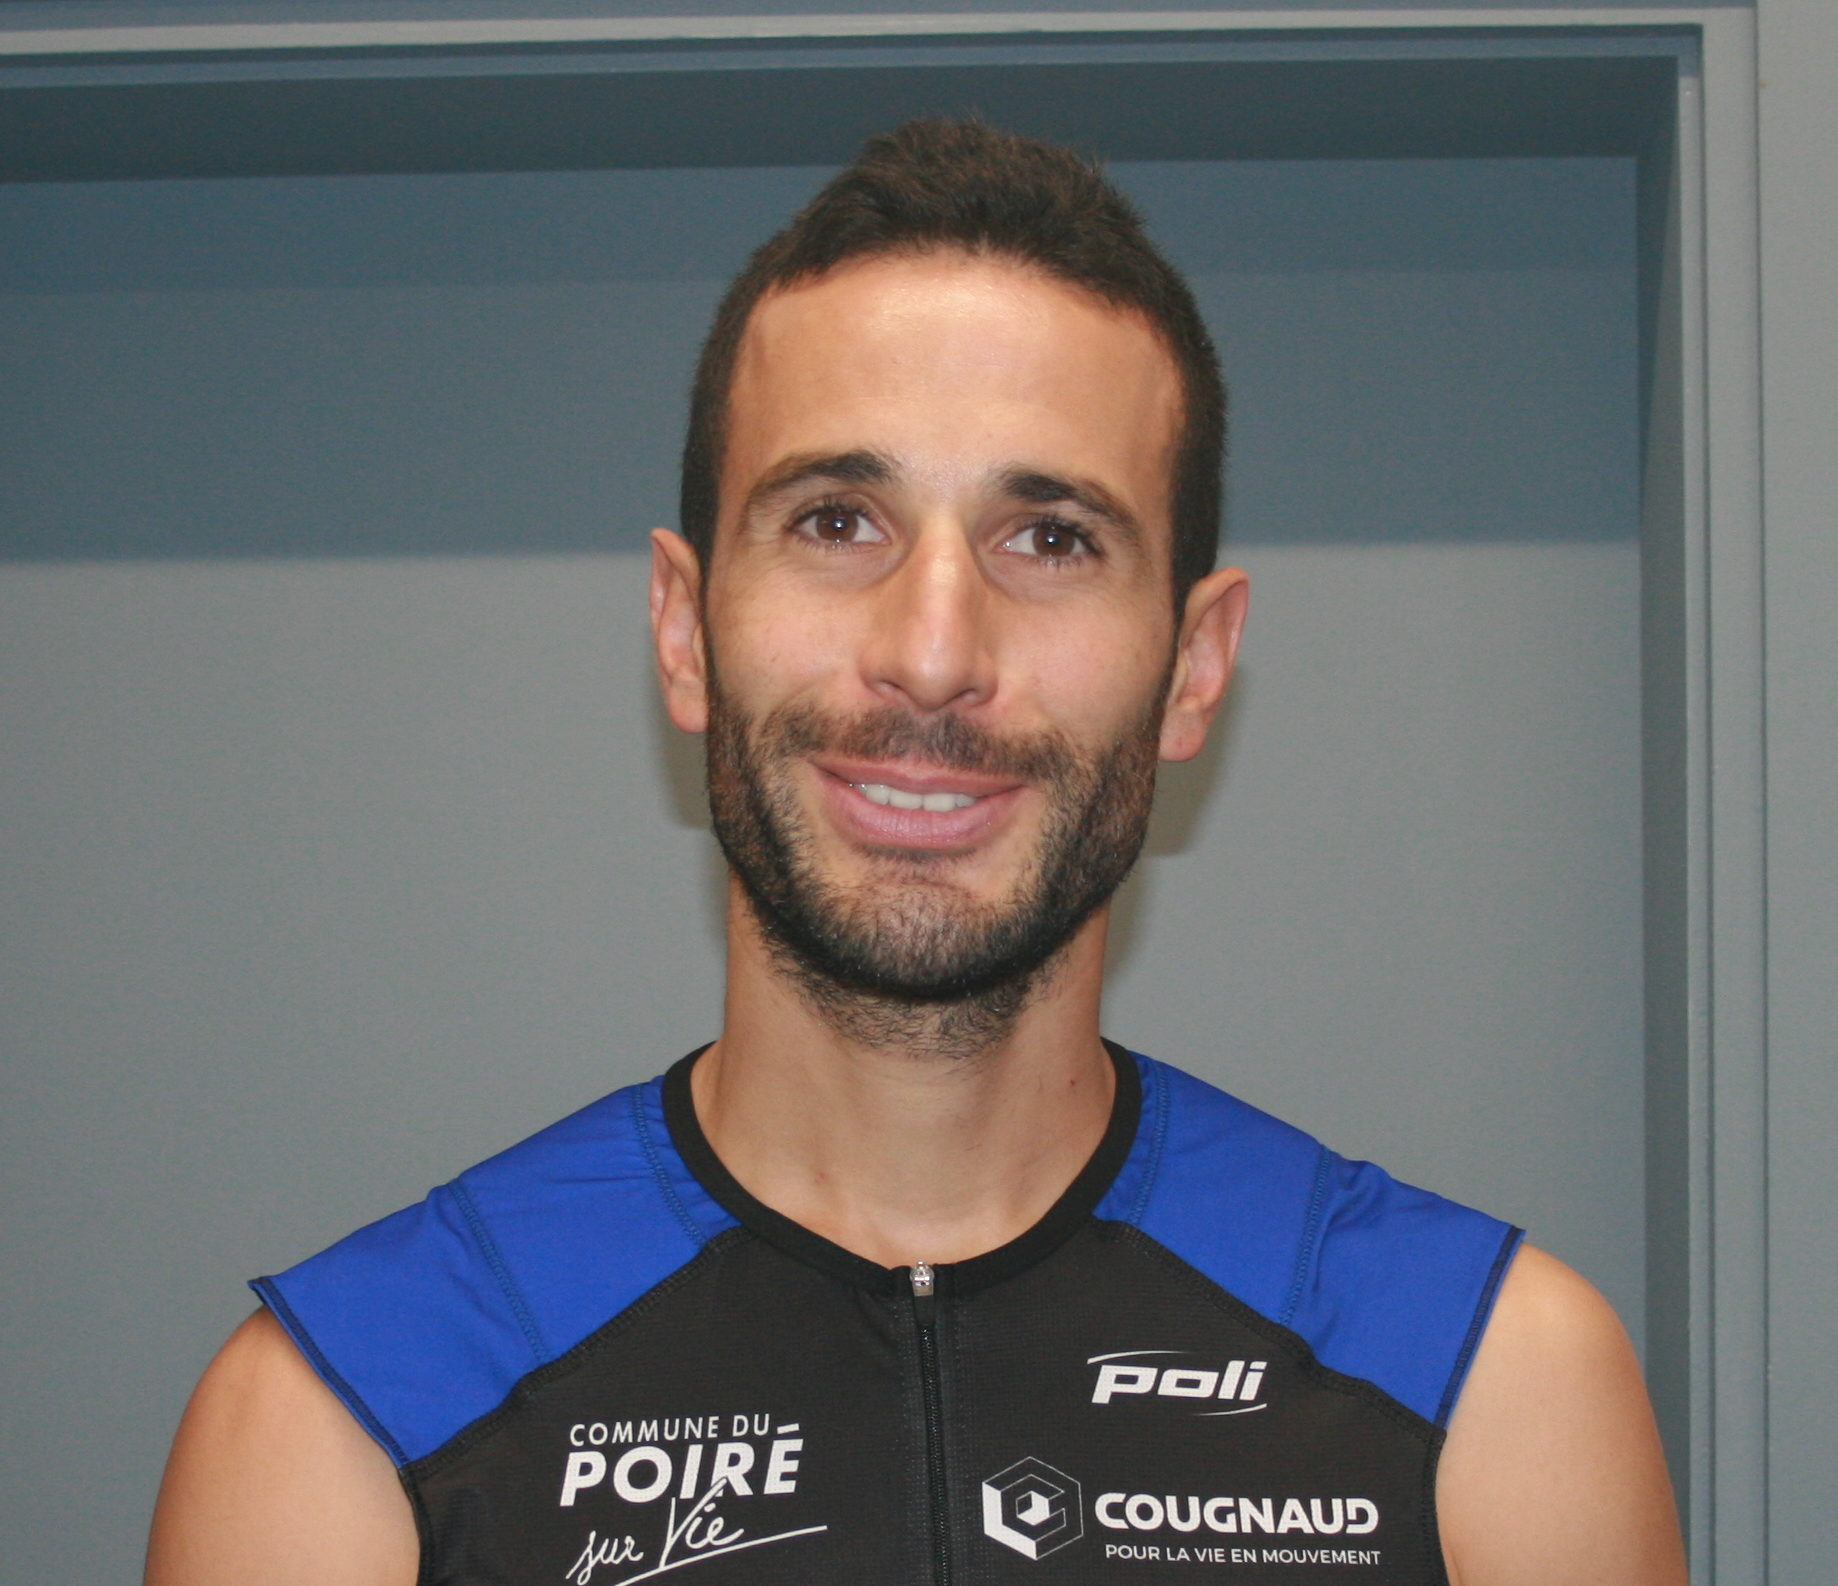 Francois GRELLIER